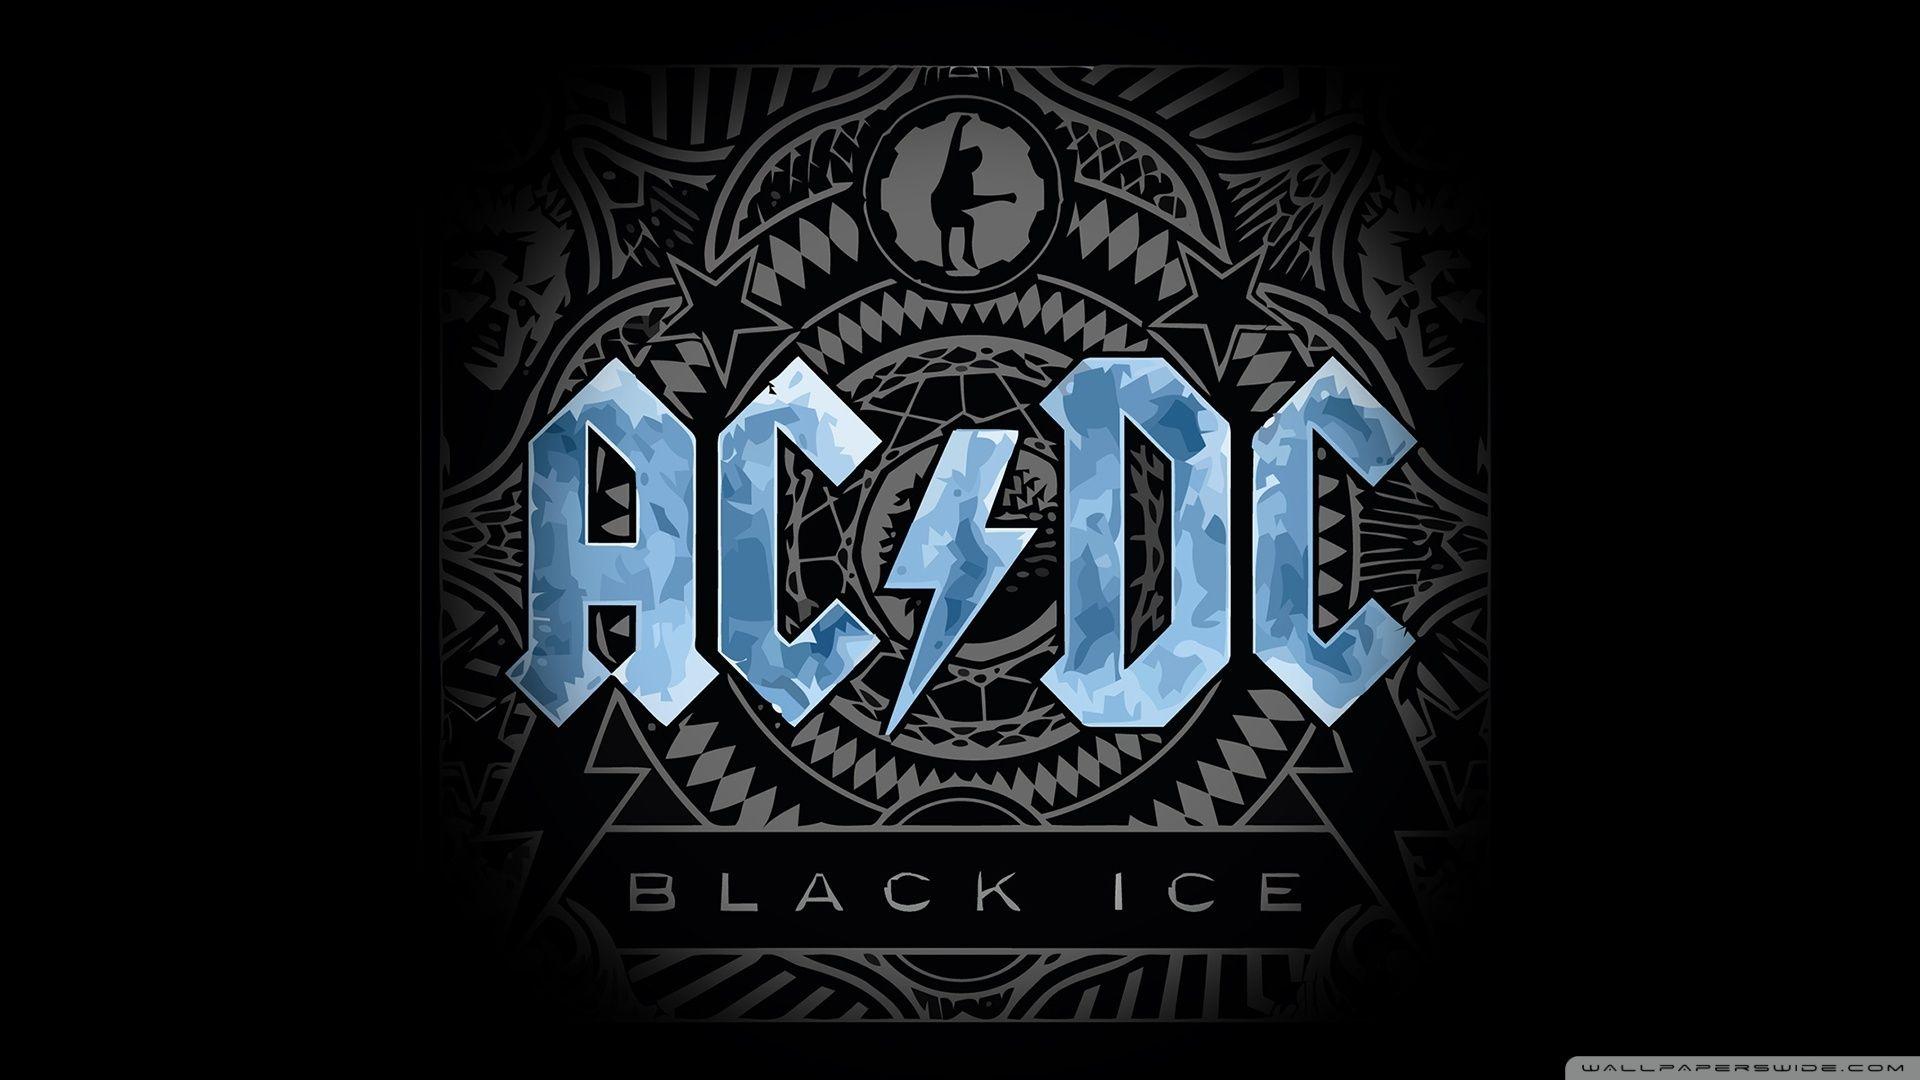 Wallpapers Hd Bandas De Rock Acdc Wallpaper Rock Band Logos